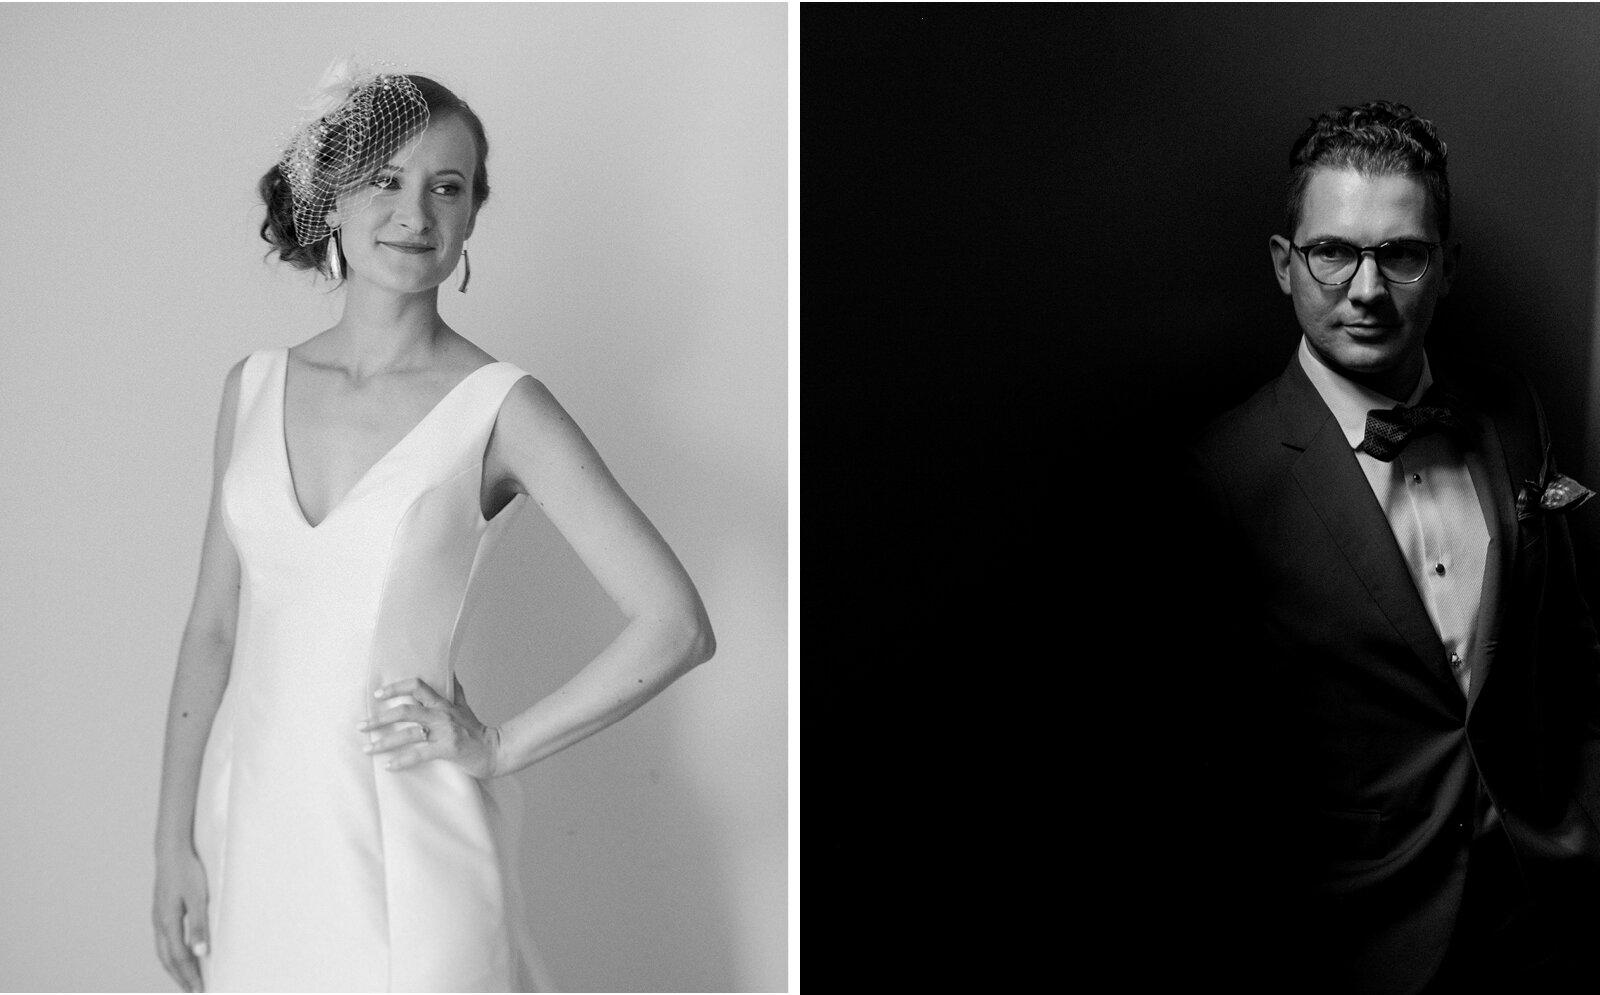 ottawa art gallery wedding portrait